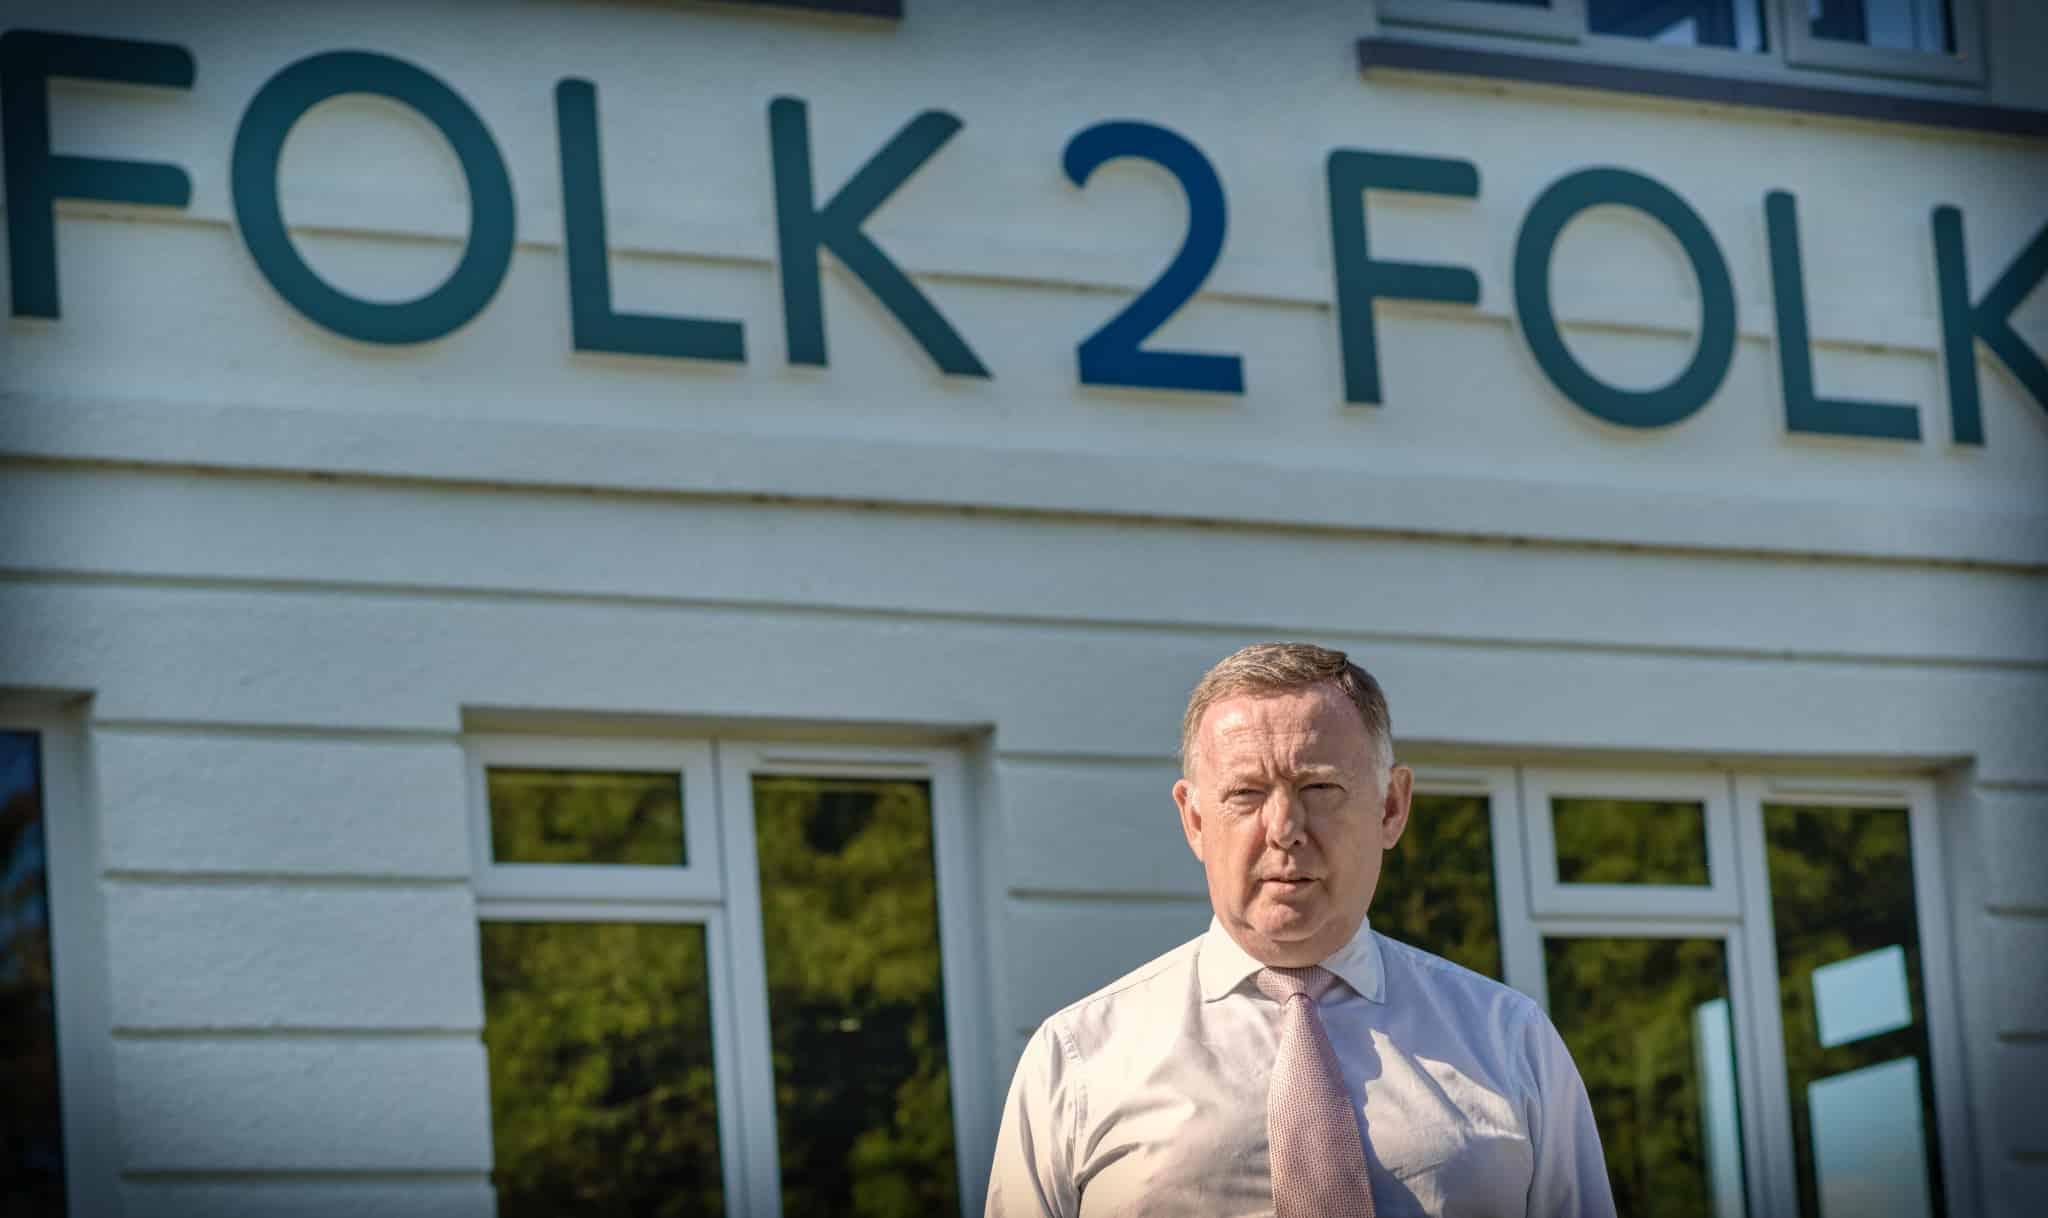 Local Focused P2P Lender Folk2Folk Appoints New Managing Director